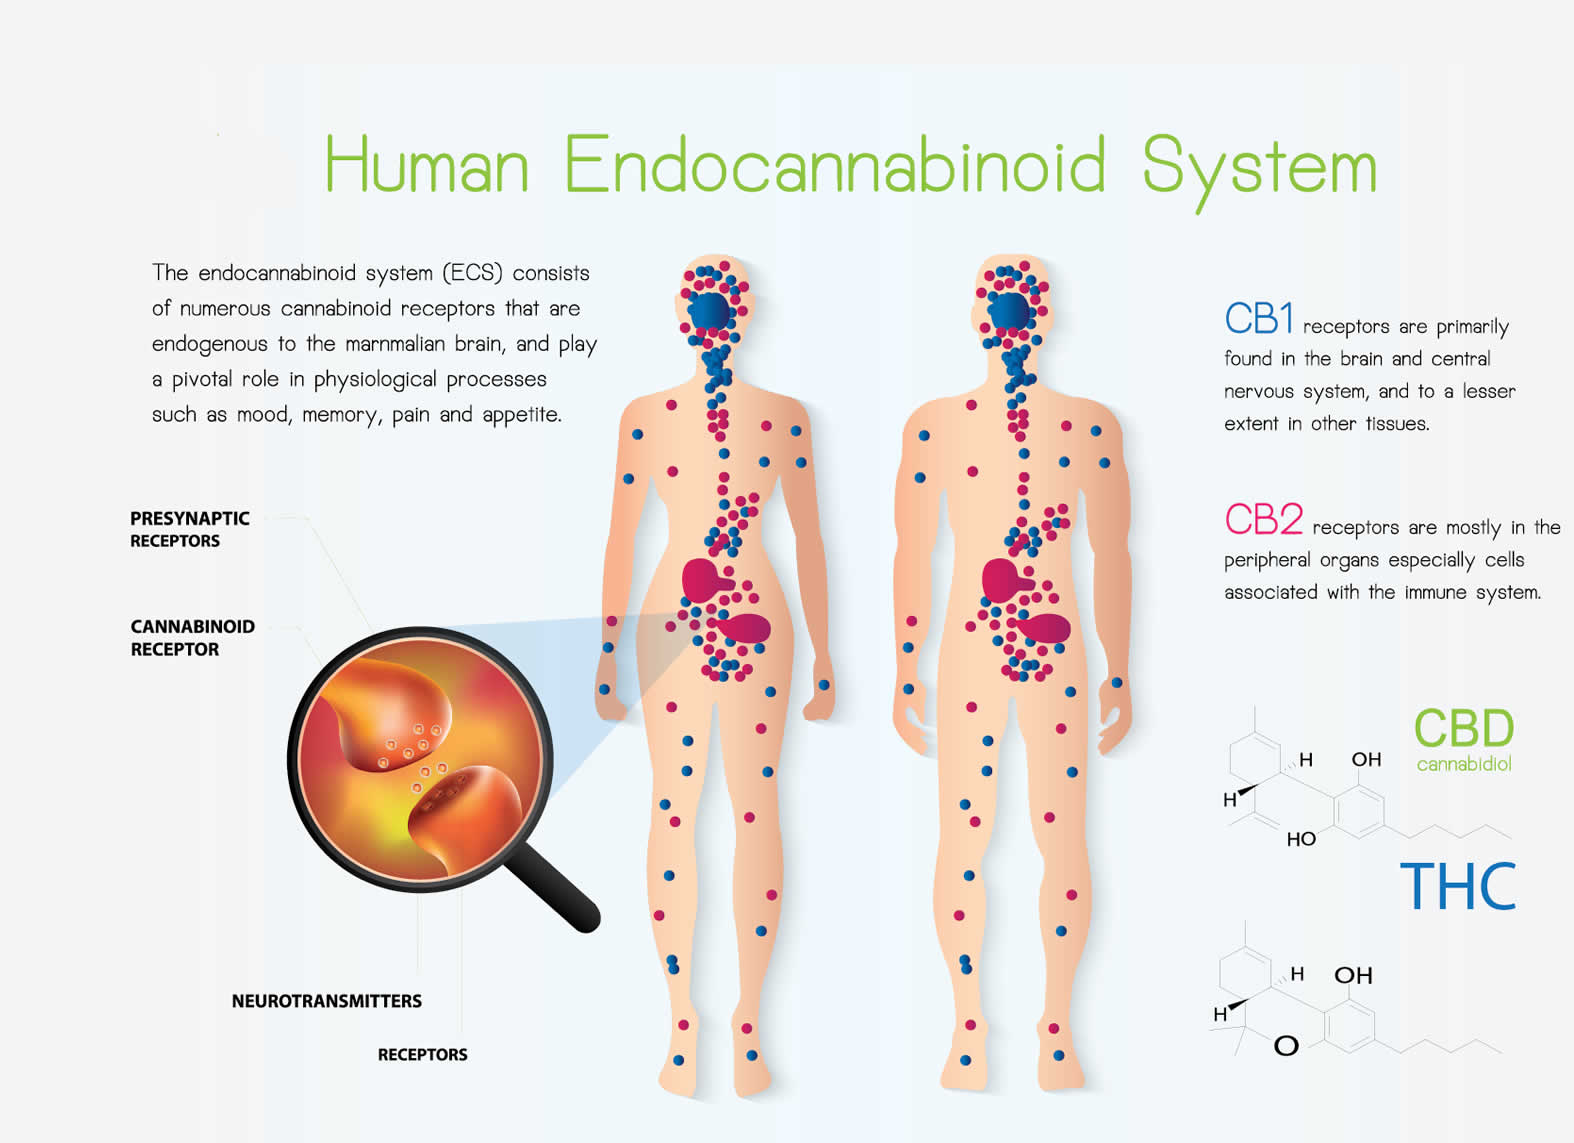 Endocannabinioid System